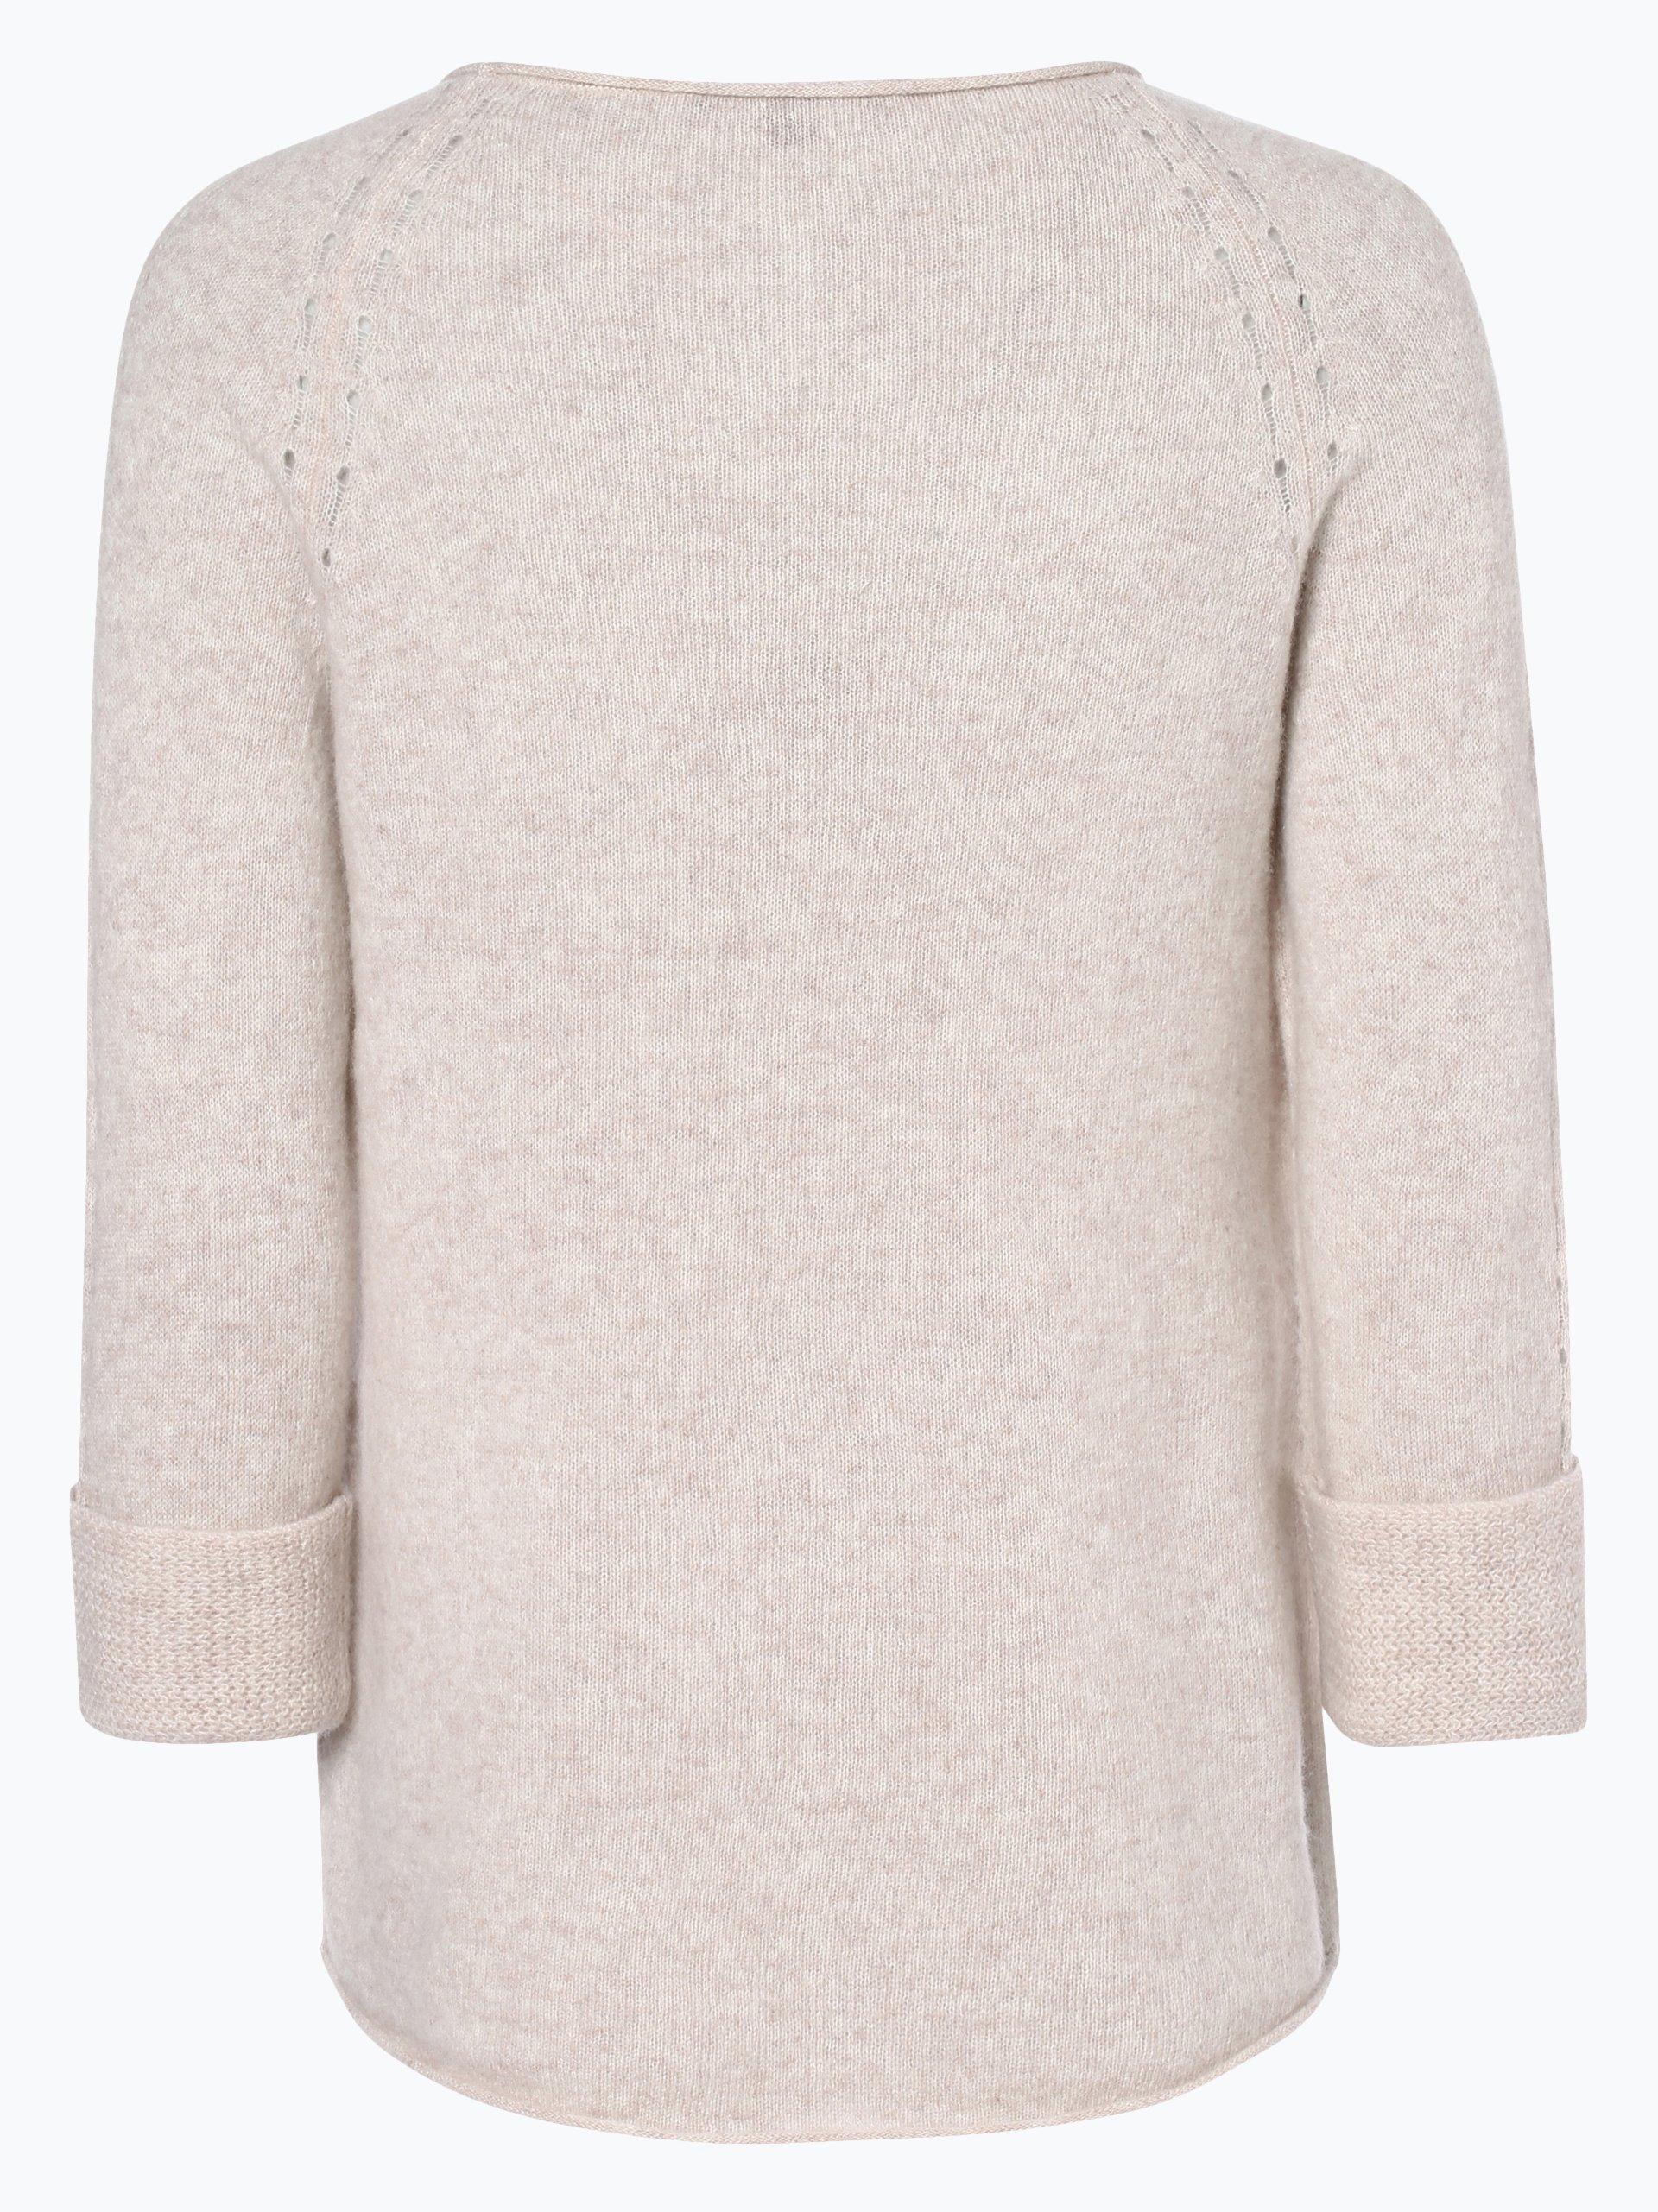 comma damen pullover mit cashmere anteil beige uni online. Black Bedroom Furniture Sets. Home Design Ideas